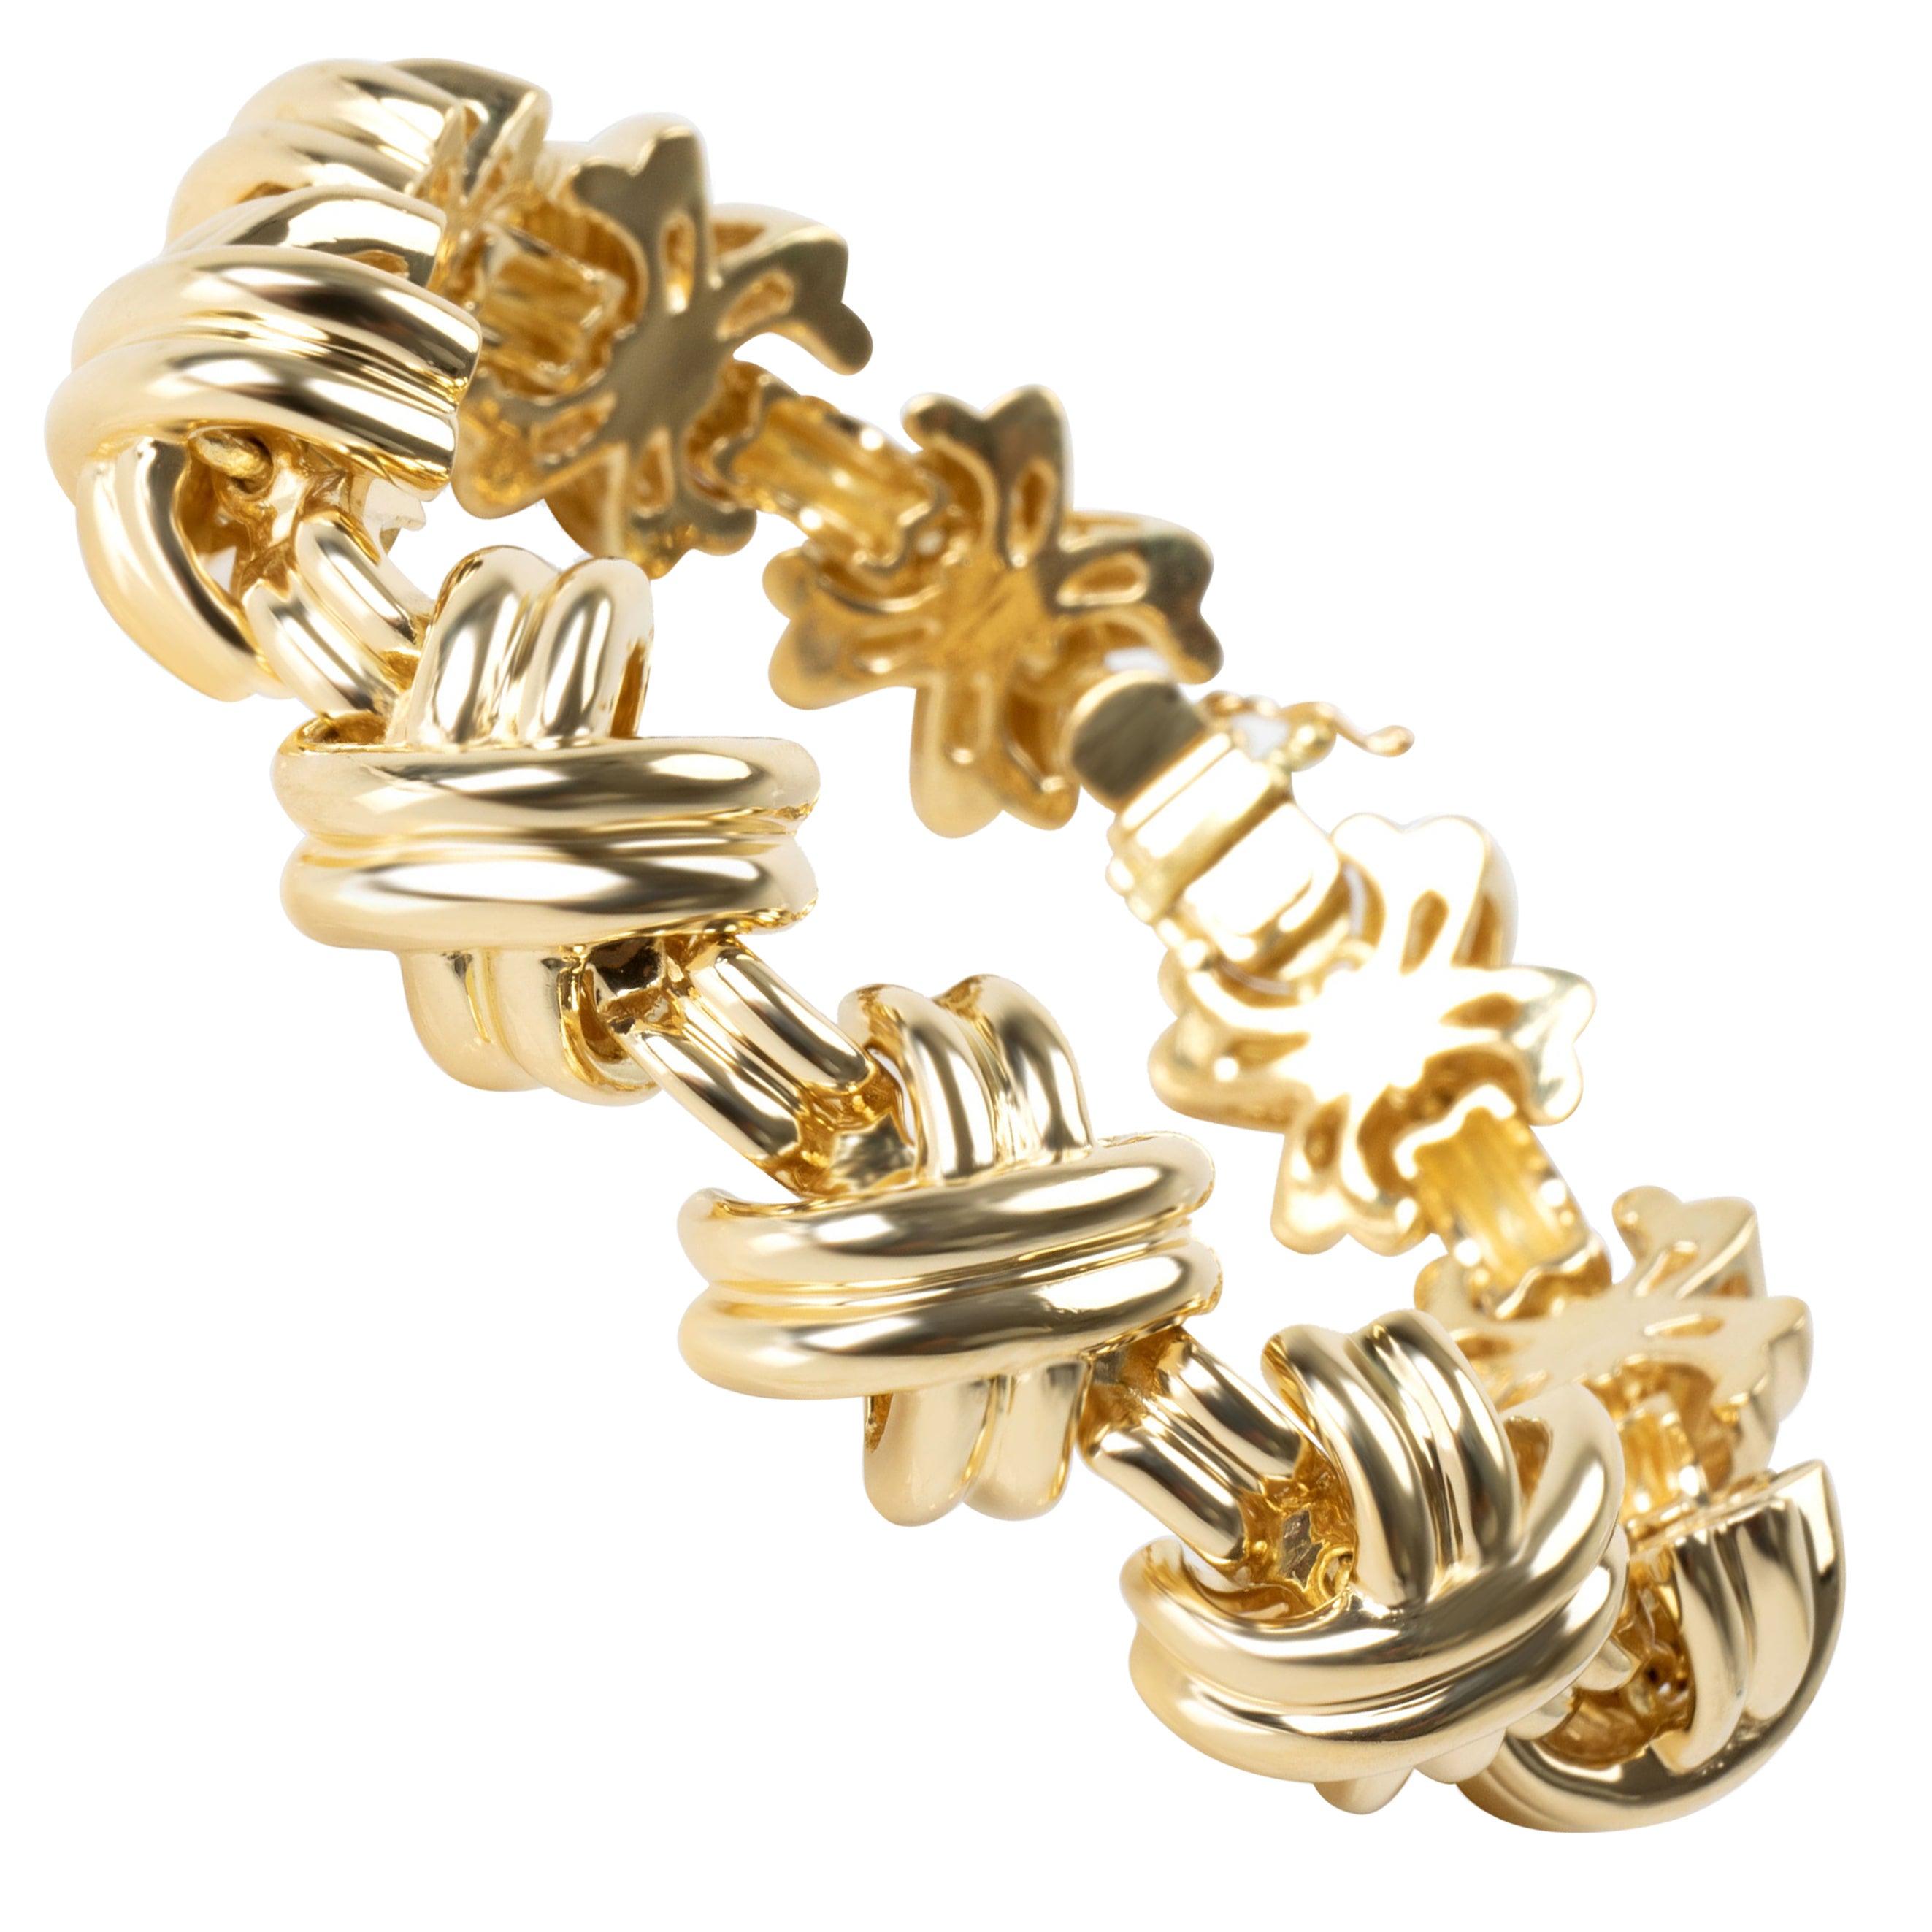 Vintage Tiffany & Co. X Bracelet in 18 Karat Yellow Gold